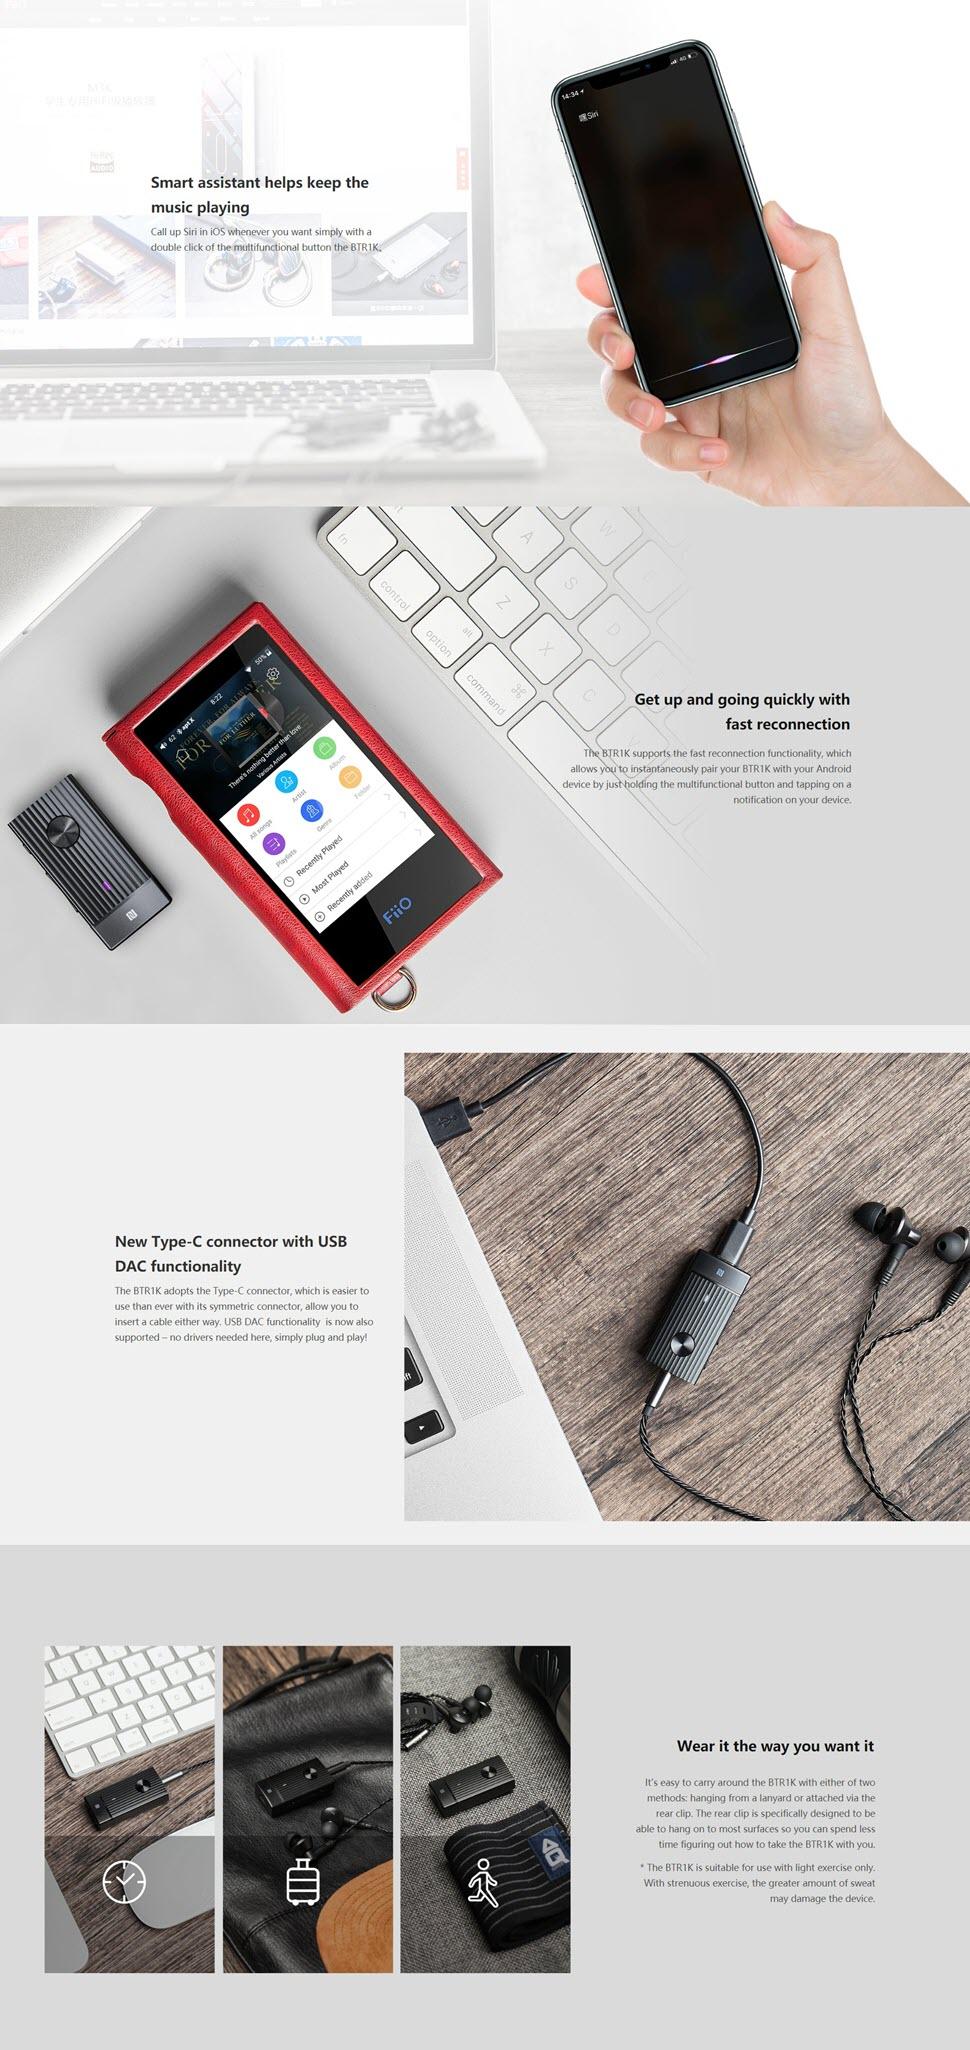 Fiio High Fidelity Bluetooth Amp Btr1k (4)